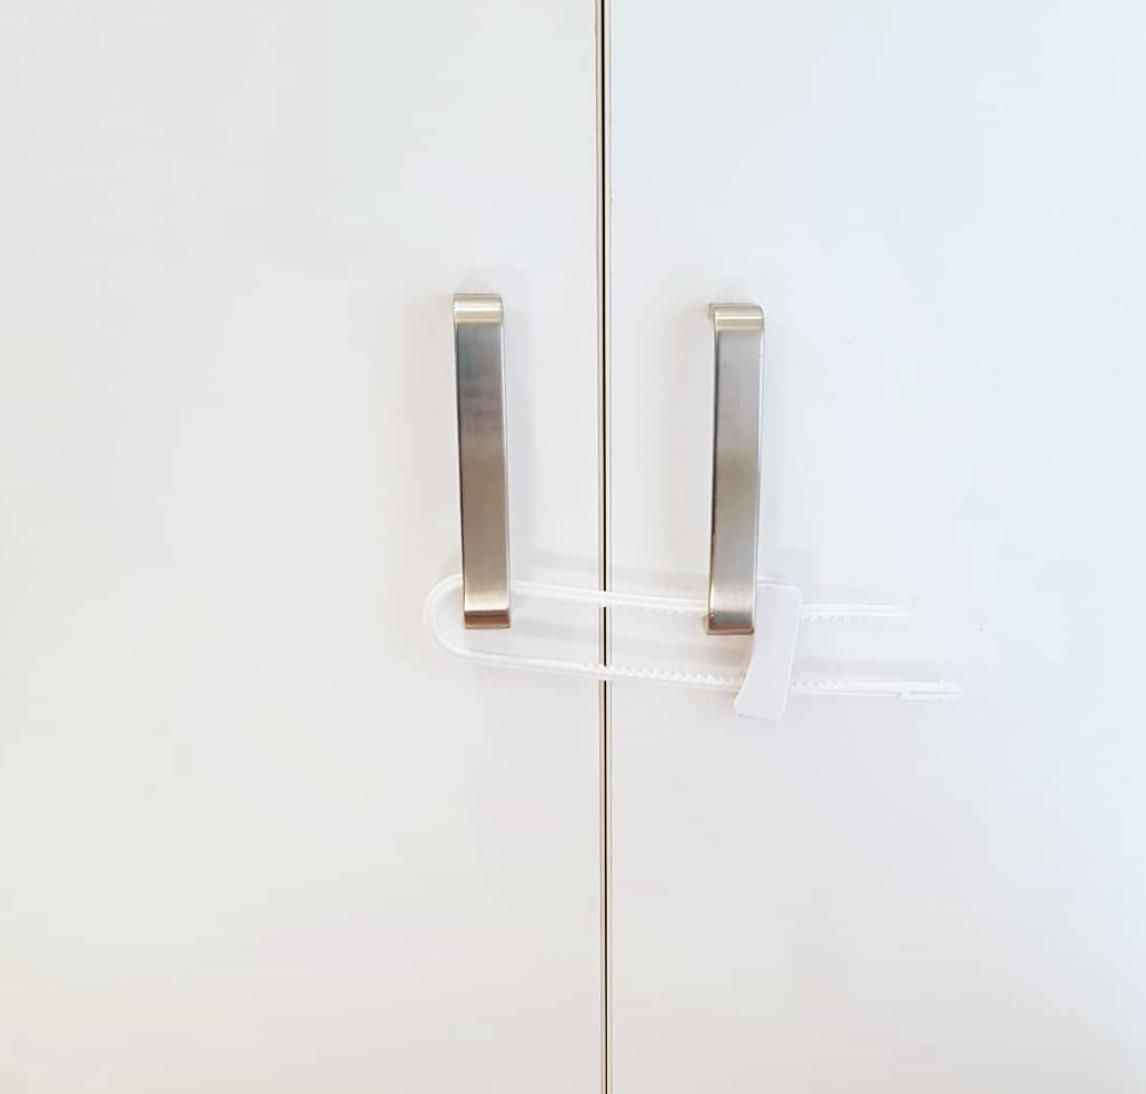 Baby proofing sliding cabinet locks